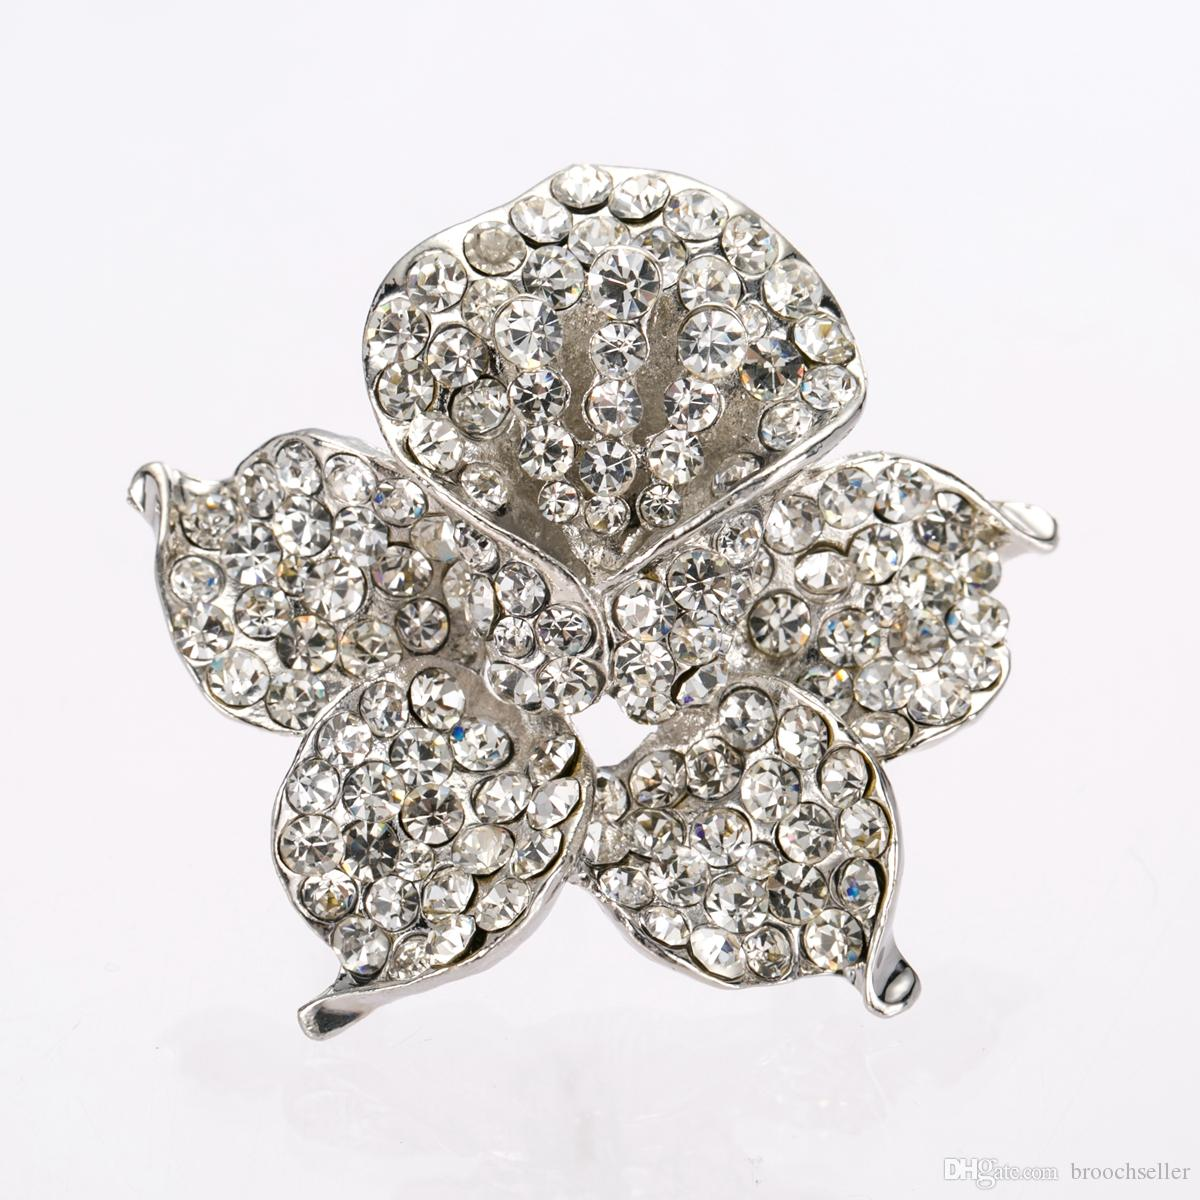 Rhodium Silver Clear Rhinestone Orchid Flower Bridal Brosch Bröllop Bridesmaid Rose Pin Prom Party